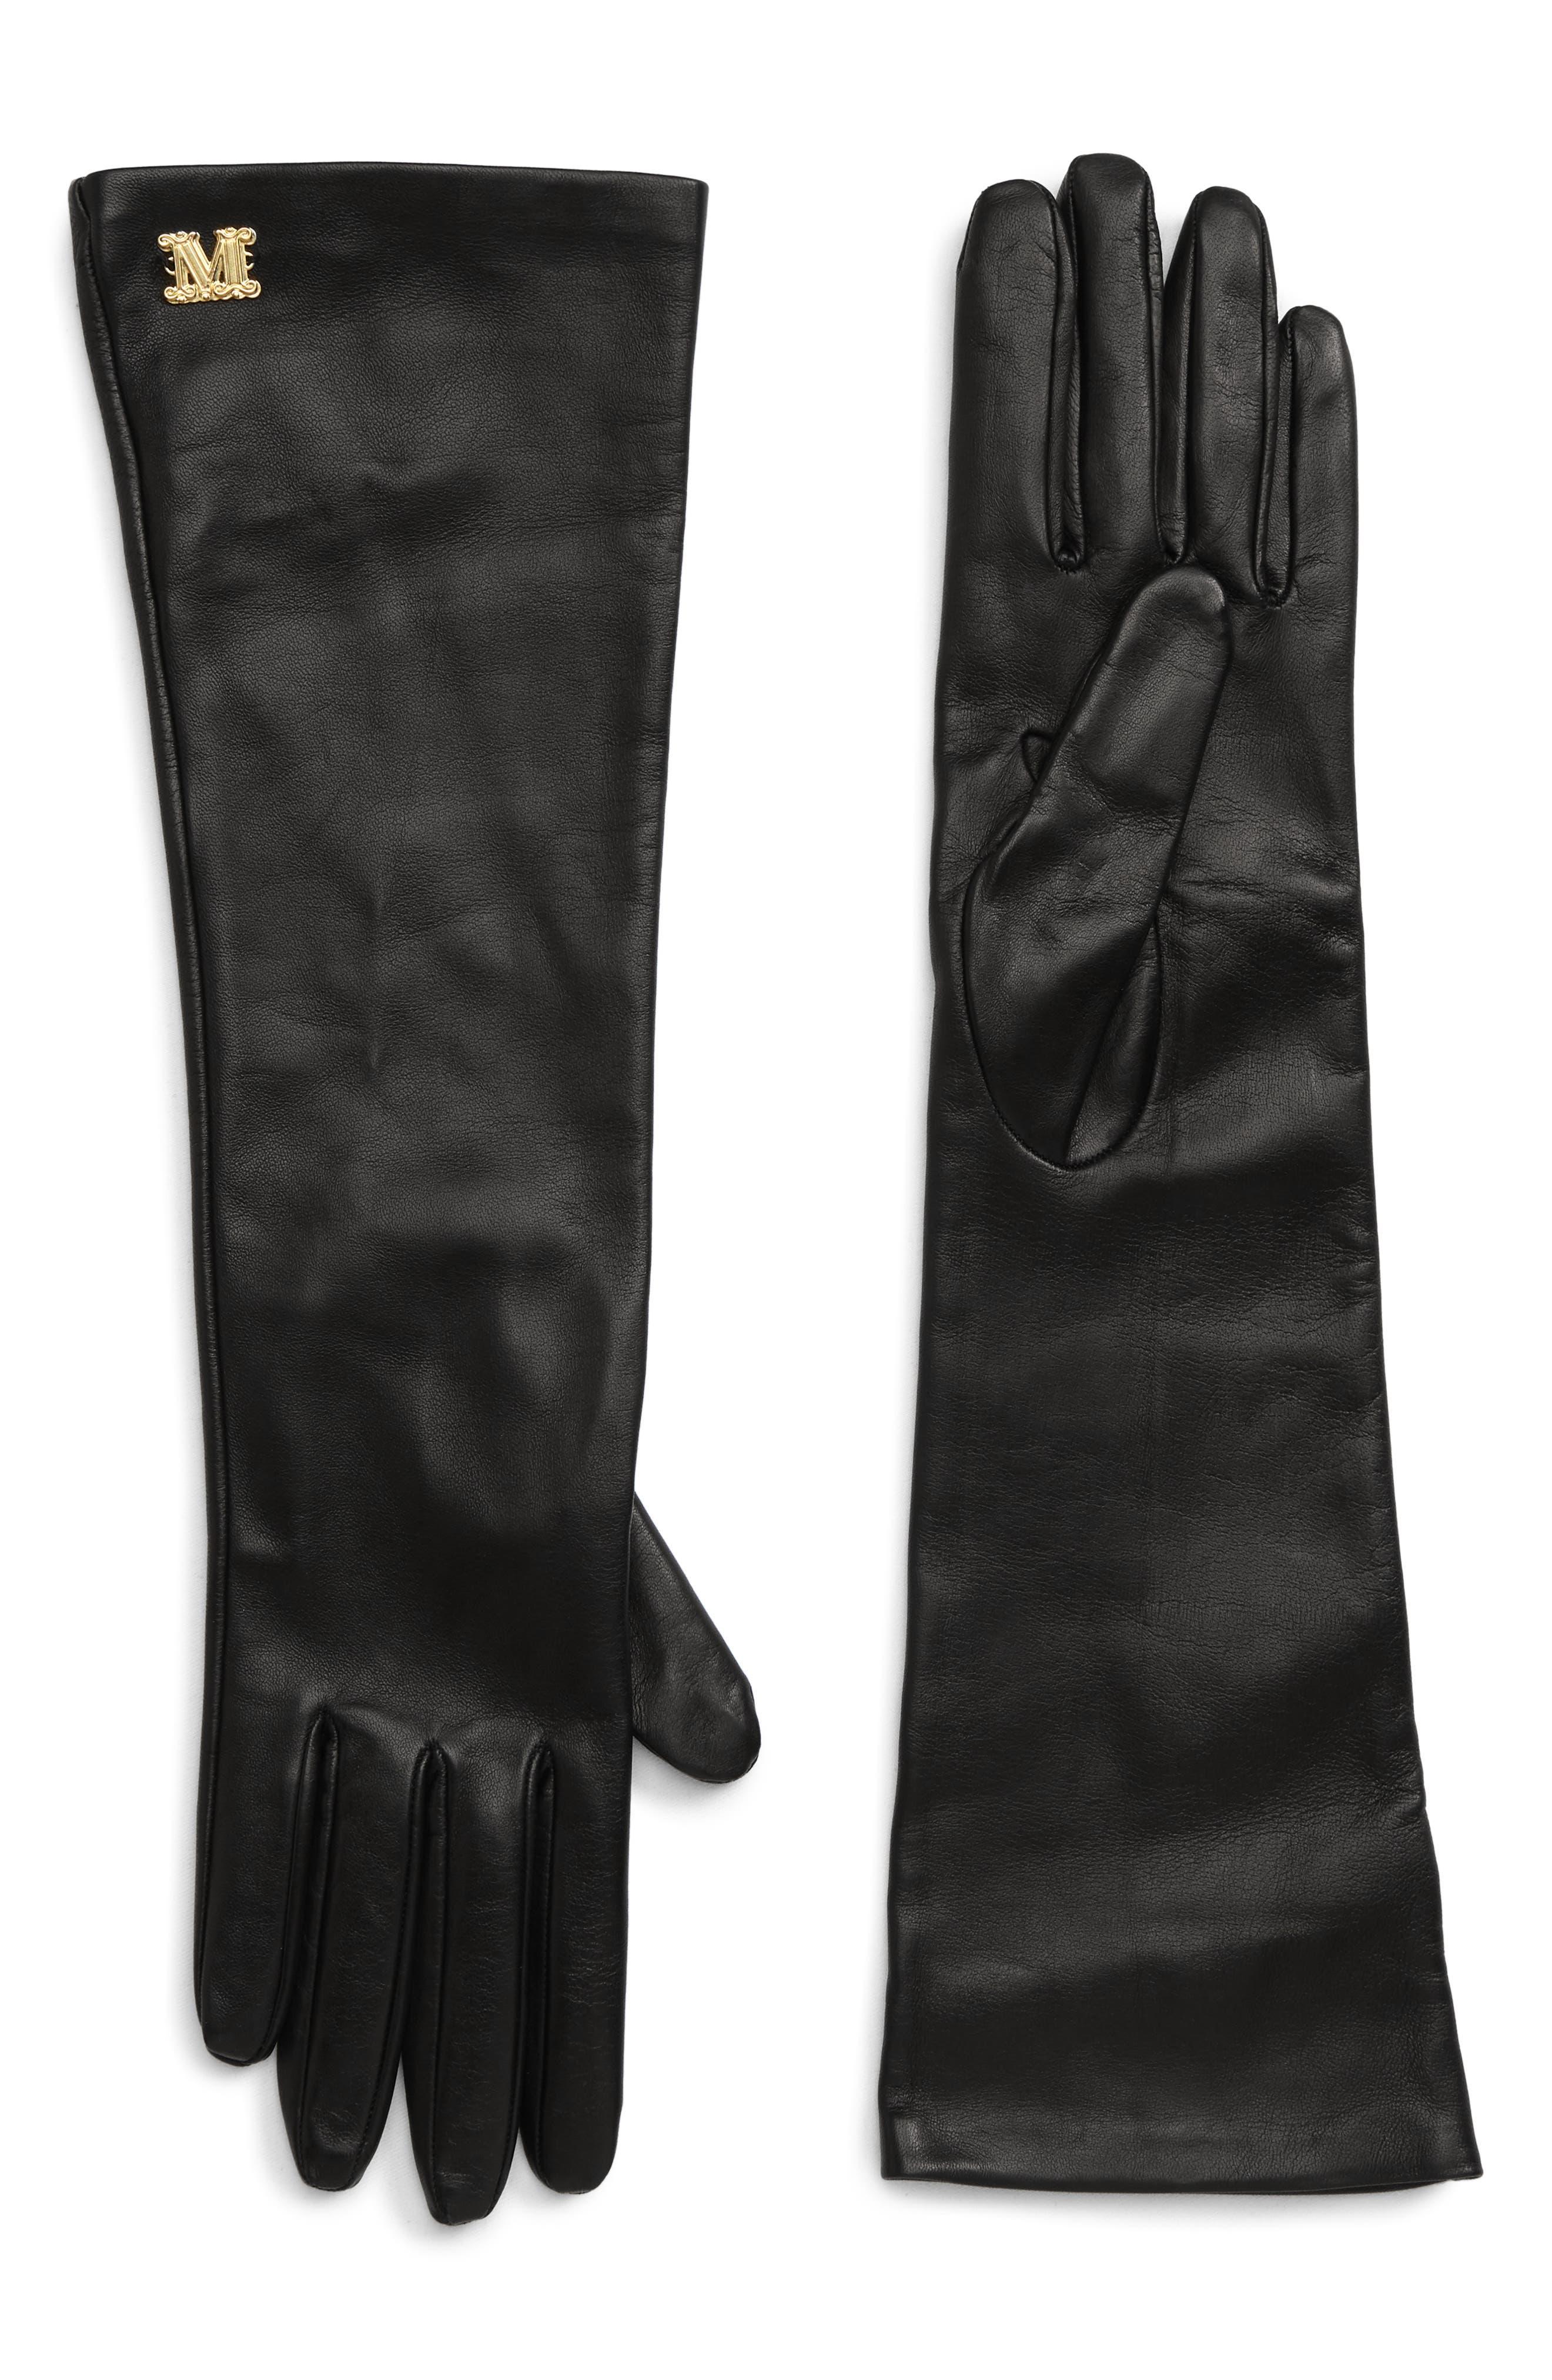 Max Mara Appia Long Leather Gloves - Black